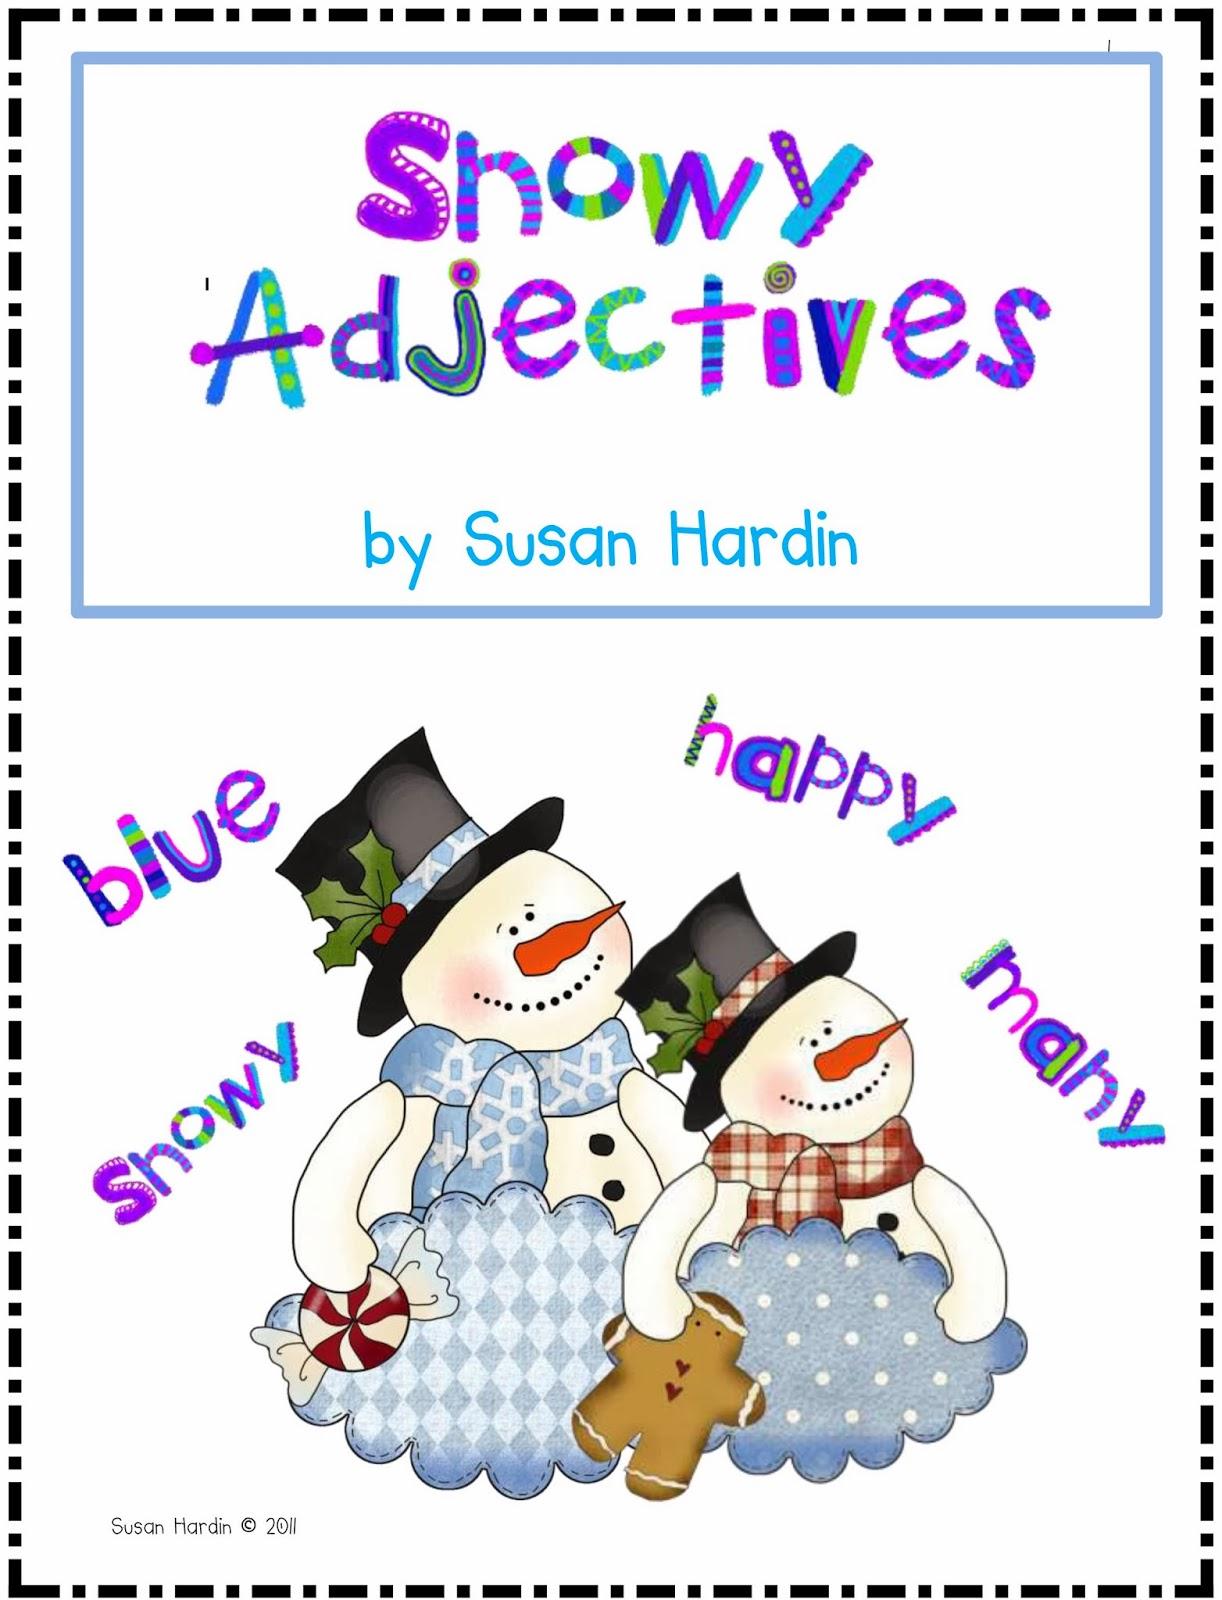 http://www.teacherspayteachers.com/Product/Snowy-Adjectives-173497